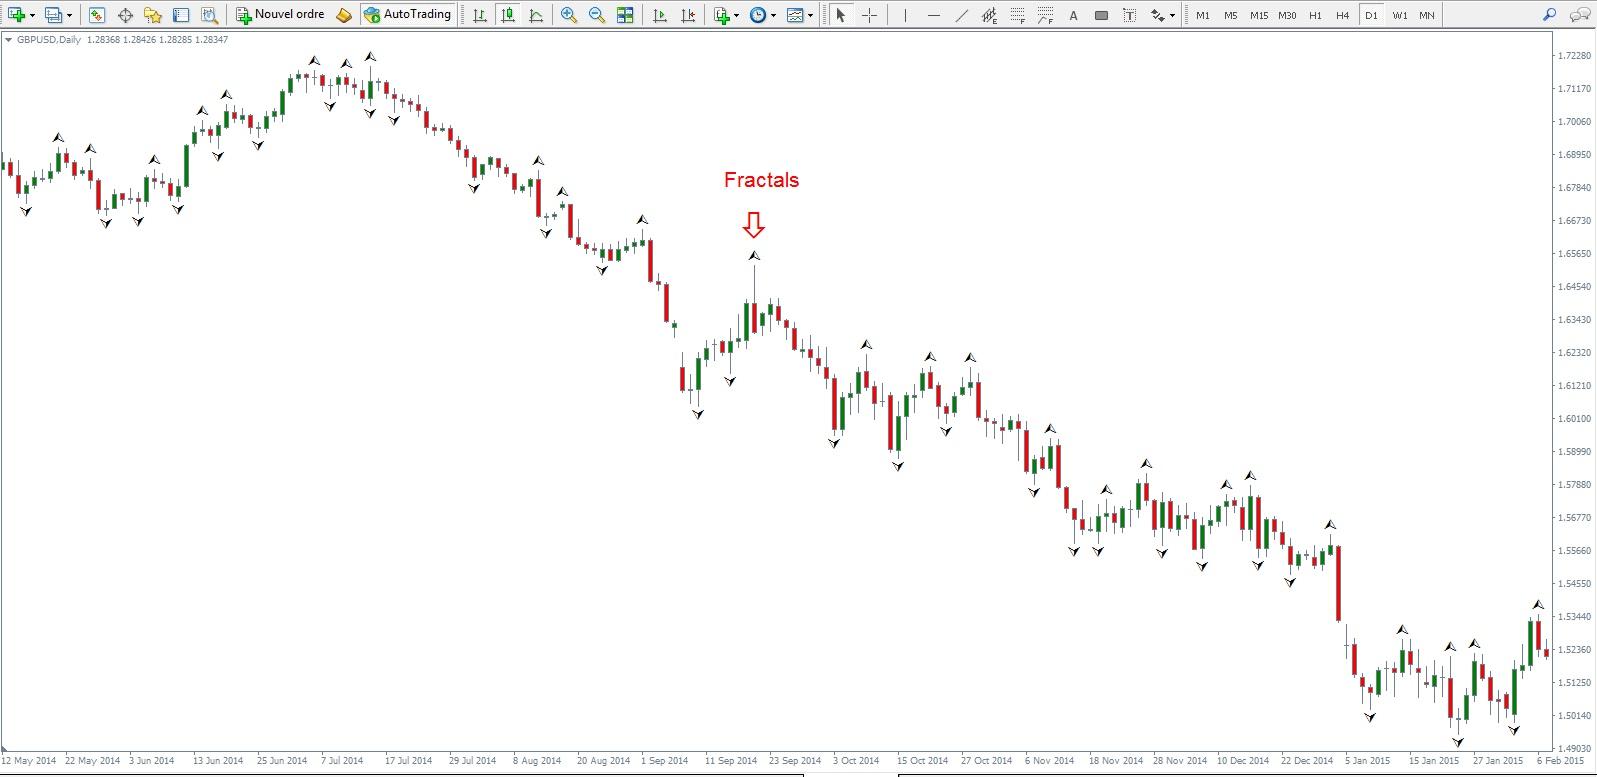 fractal indicateur de trading metatrader